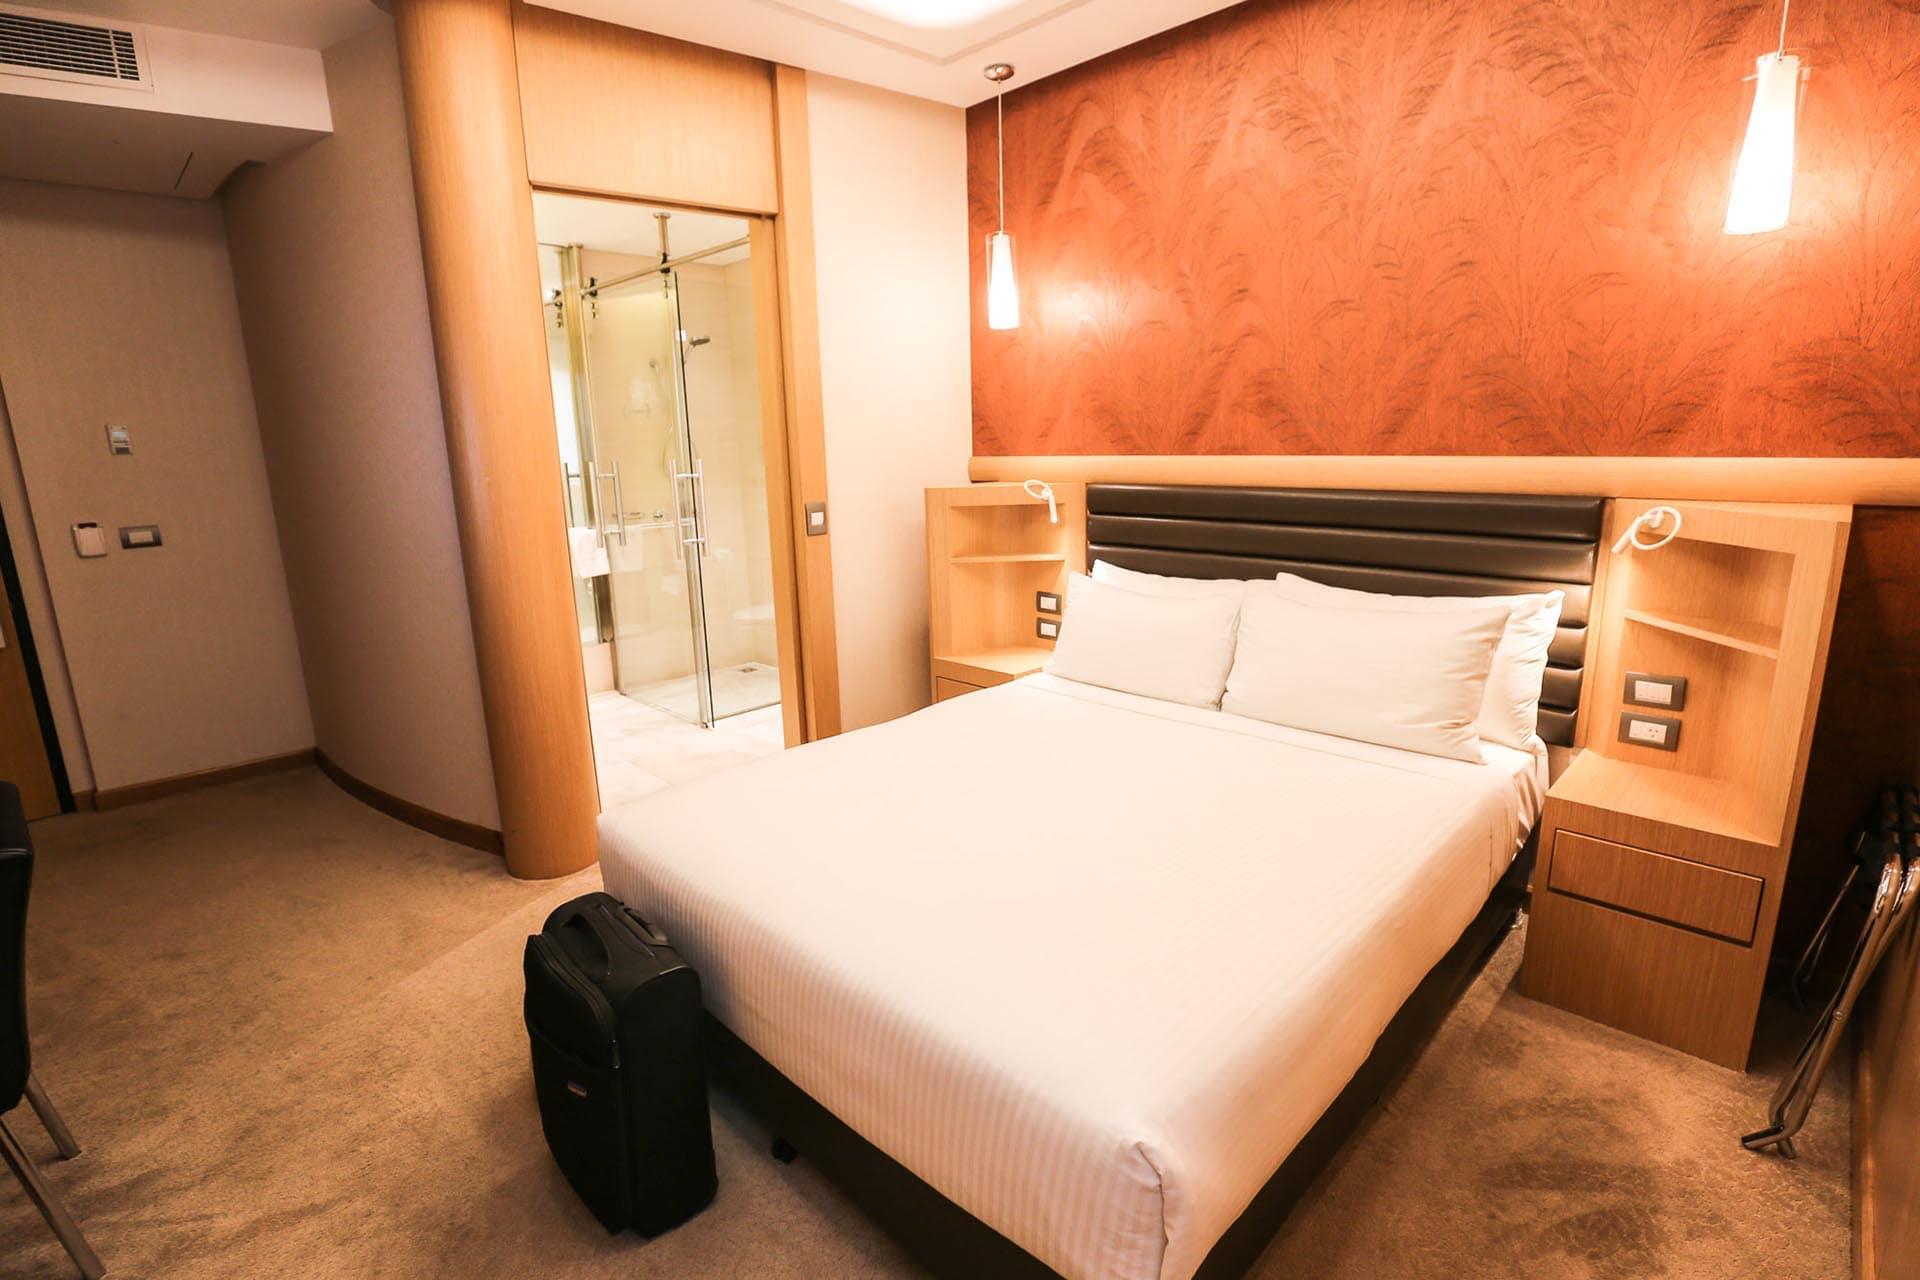 tank-steam-hotel-sydney-review-1